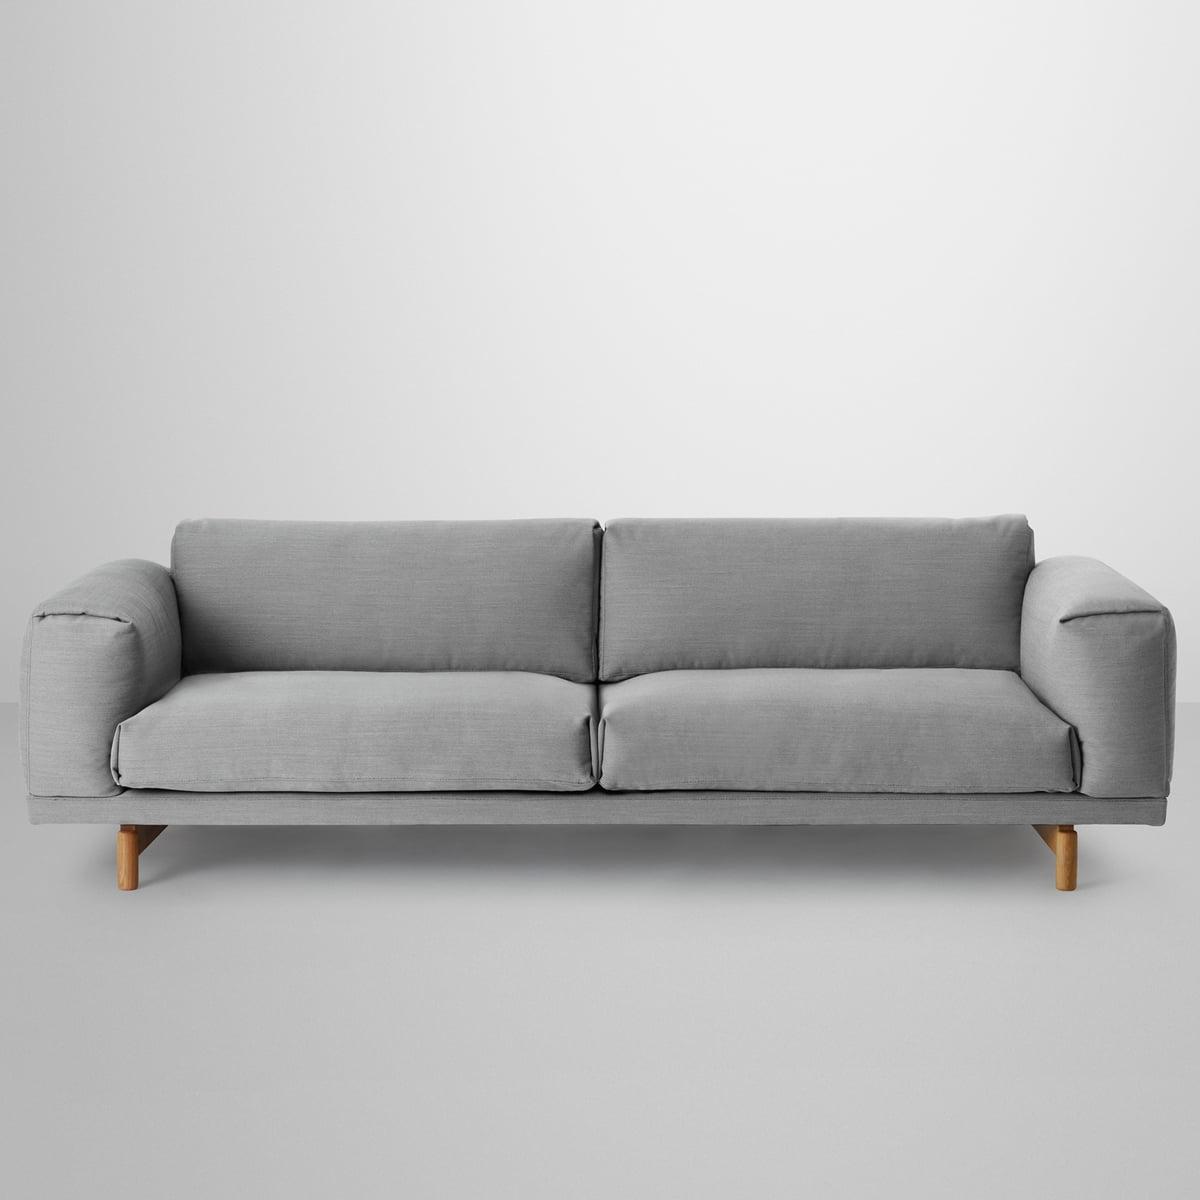 Full Size of Rest Sofa 3 Sitzer Von Muuto Connoshop Himolla Eck Le Corbusier Leinen Rolf Benz Barock Chesterfield Grau 2 5 Höffner Big Garten Ecksofa Relaxfunktion Sofa Sofa 3 Sitzer